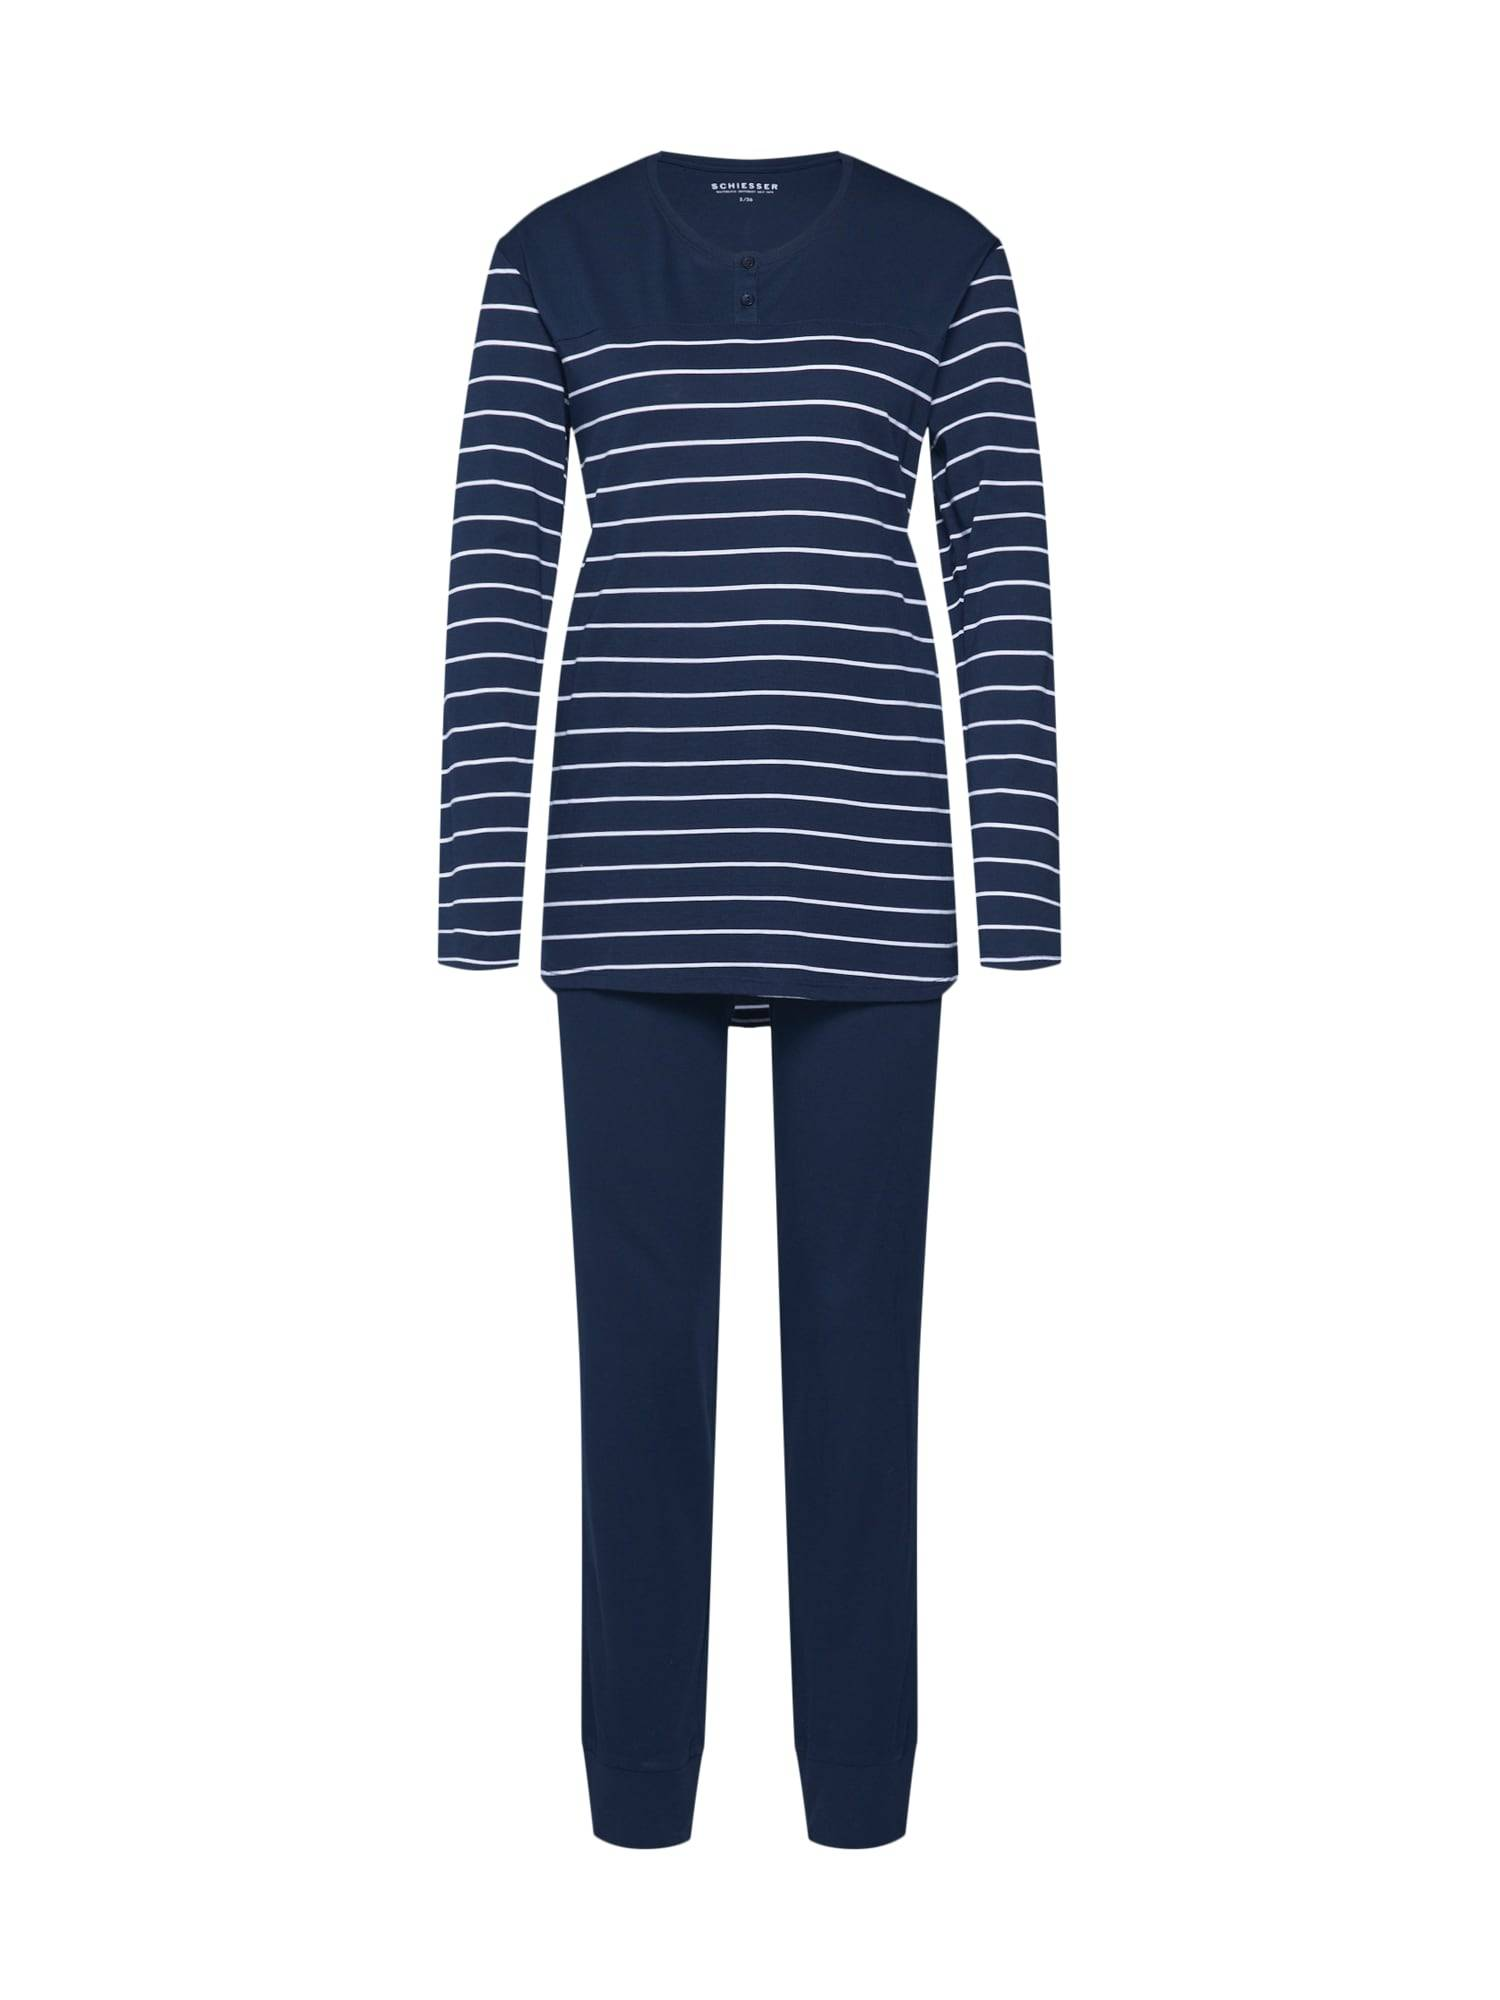 SCHIESSER Pyjama  - Bleu - Taille: 54 - female